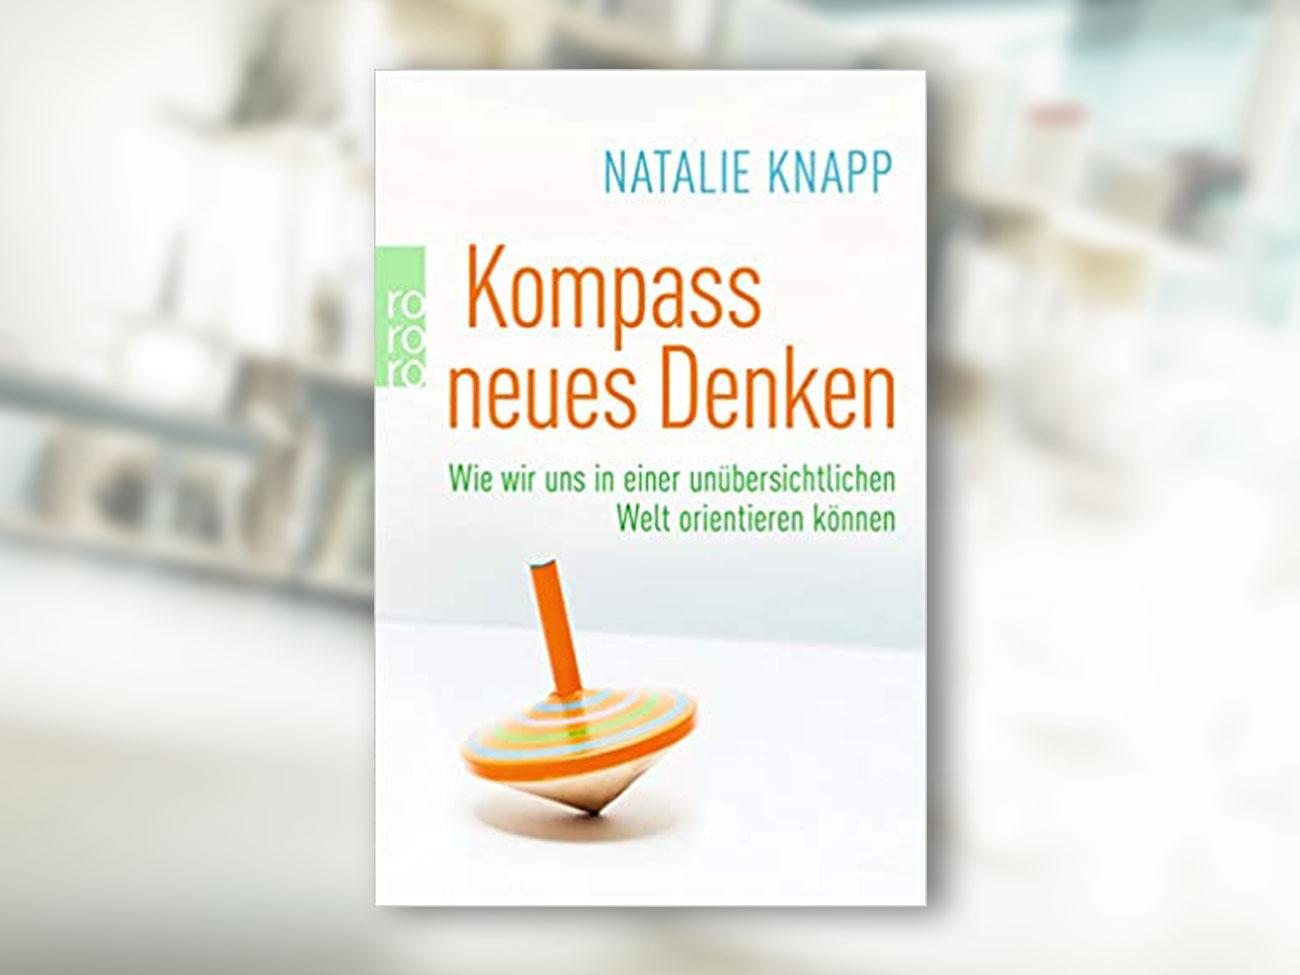 Natalie Knapp, Kompass neues Denken